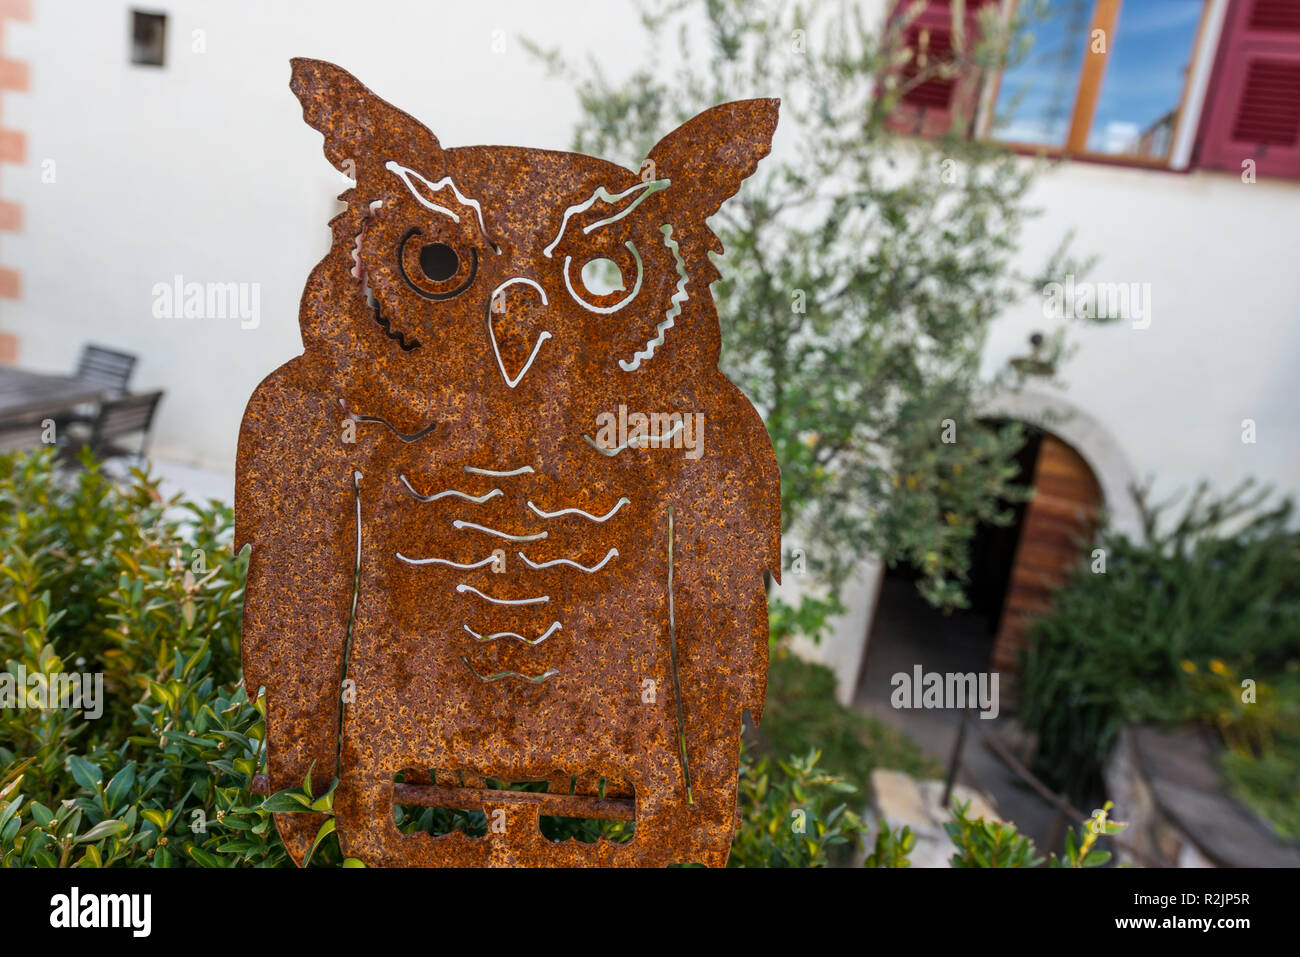 Italy, South Tyrol, Alto Adige, Überetsch, South Tyrol's South, Wine Route, Girlan, Ignaz Niedrist Winery, logotype, metal owl - Stock Image